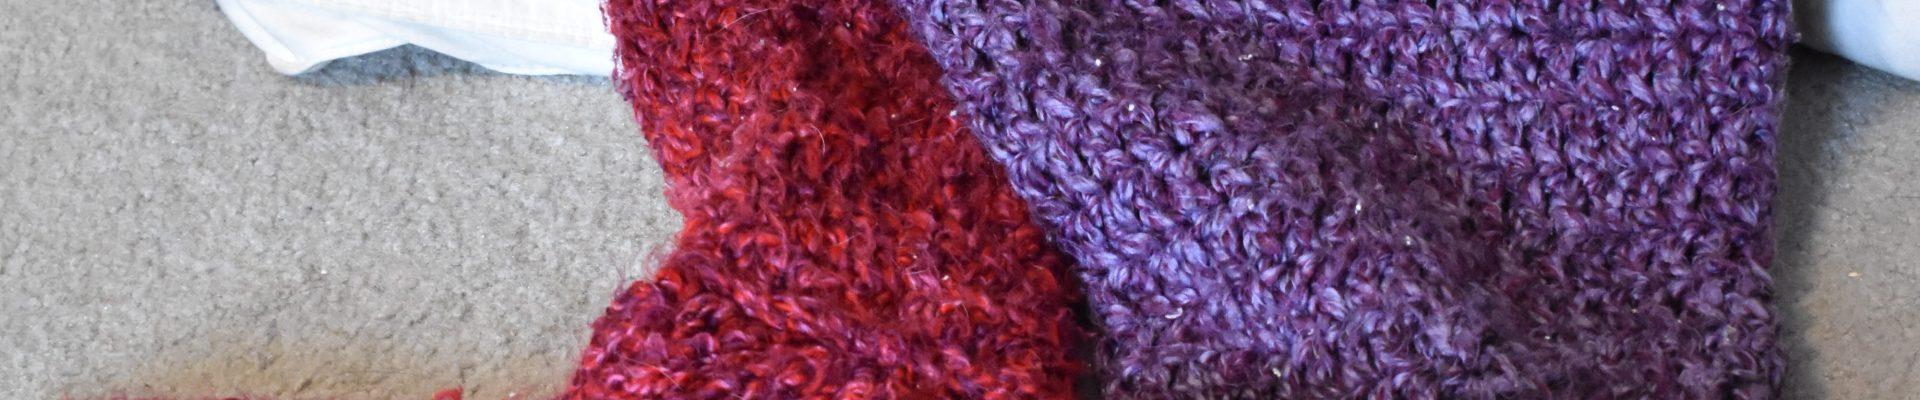 Lala's Crochet – A Crochet Mermaid Tail